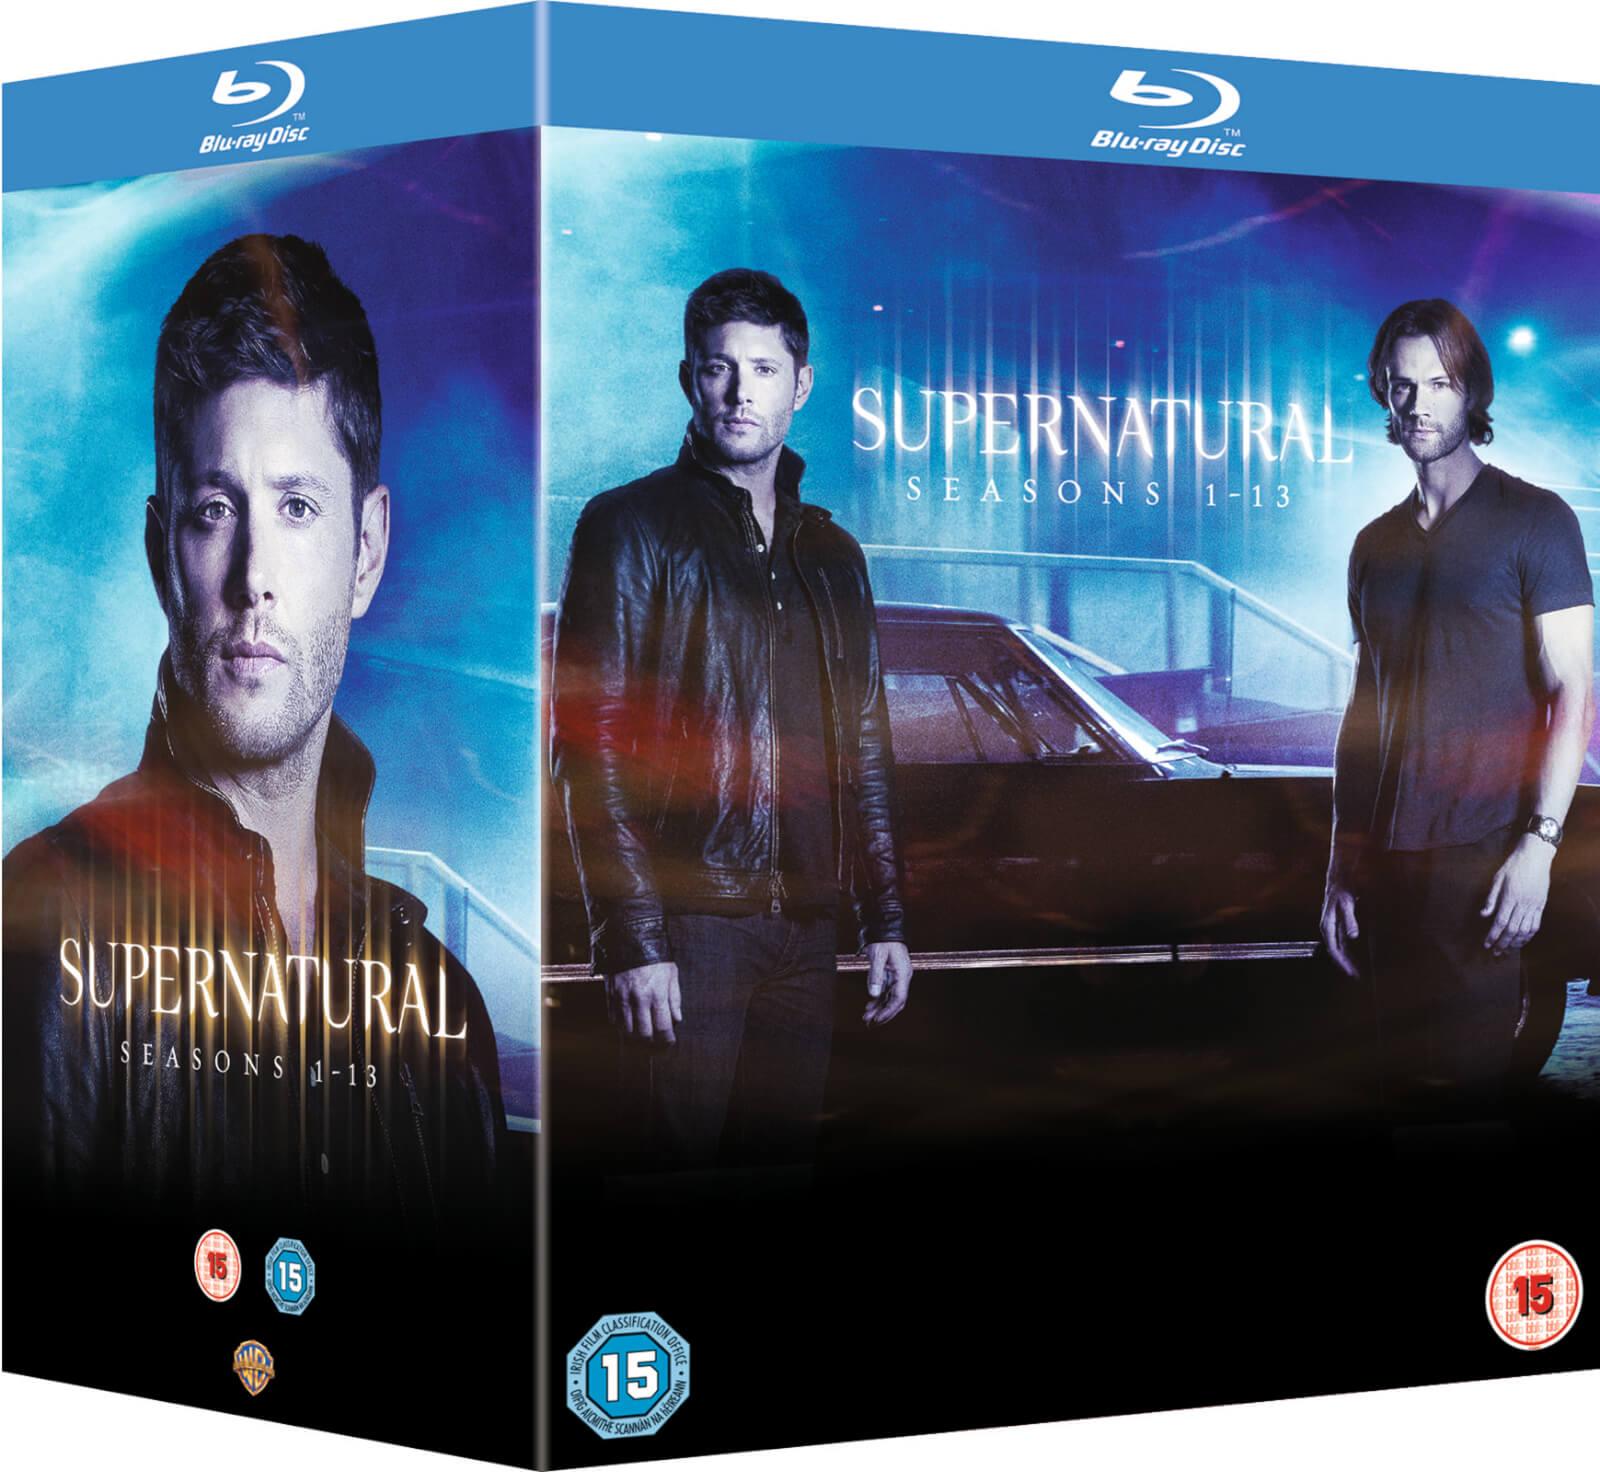 SUPERNATURAL SEASONS 1 - 13 Blu-Rays 47 Discs Boxset Collection £69.99 @ Zavvi